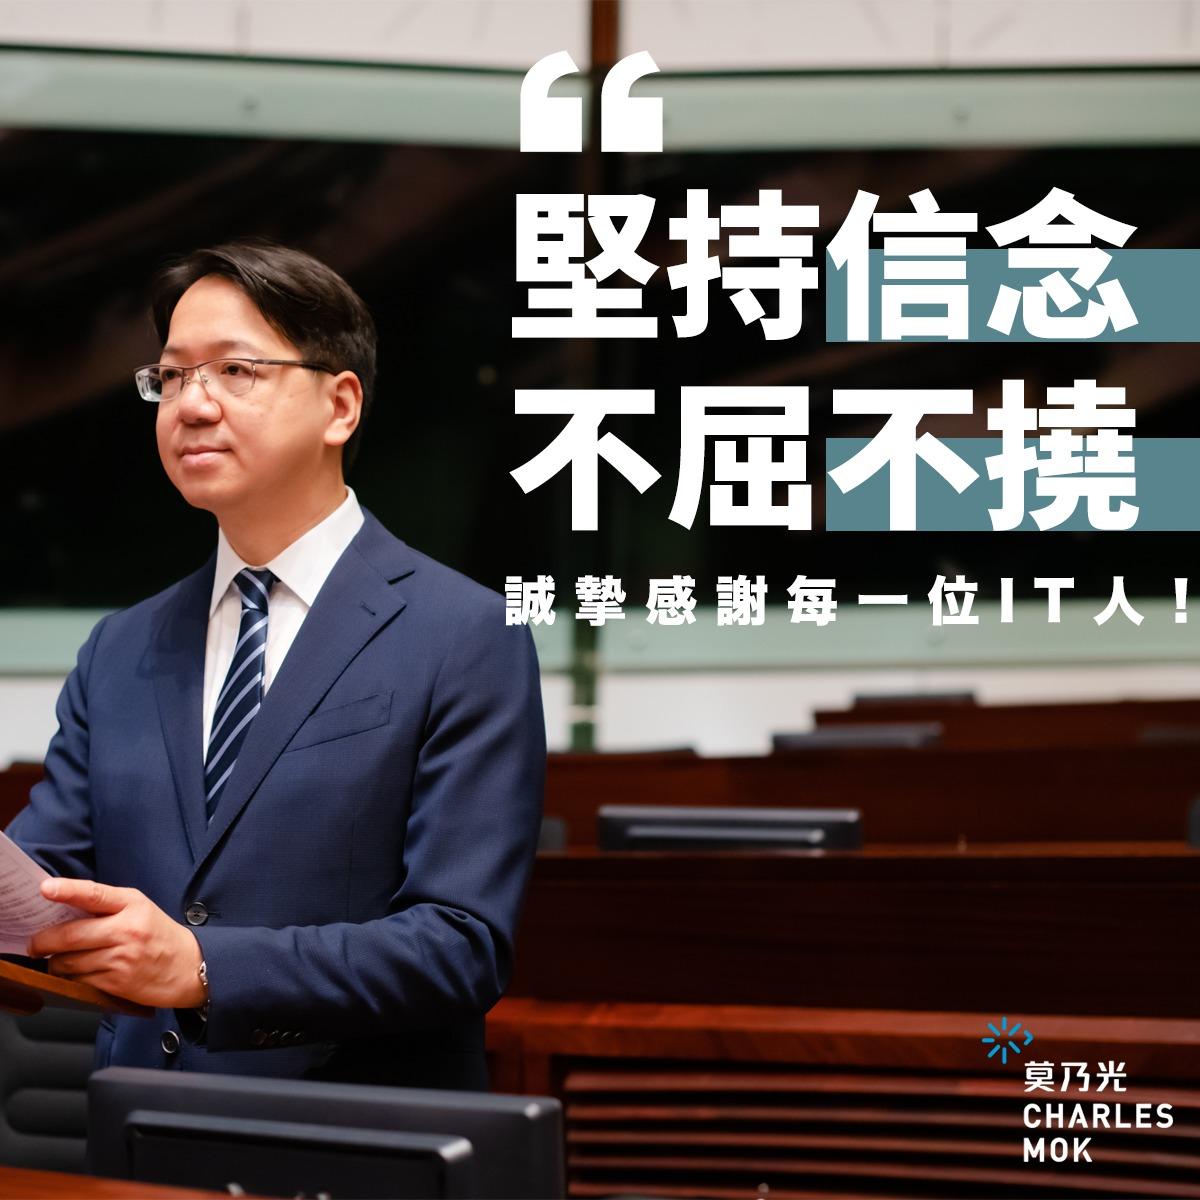 e-Office of Charles Mok | 莫乃光(立法會議員)網上辦公室